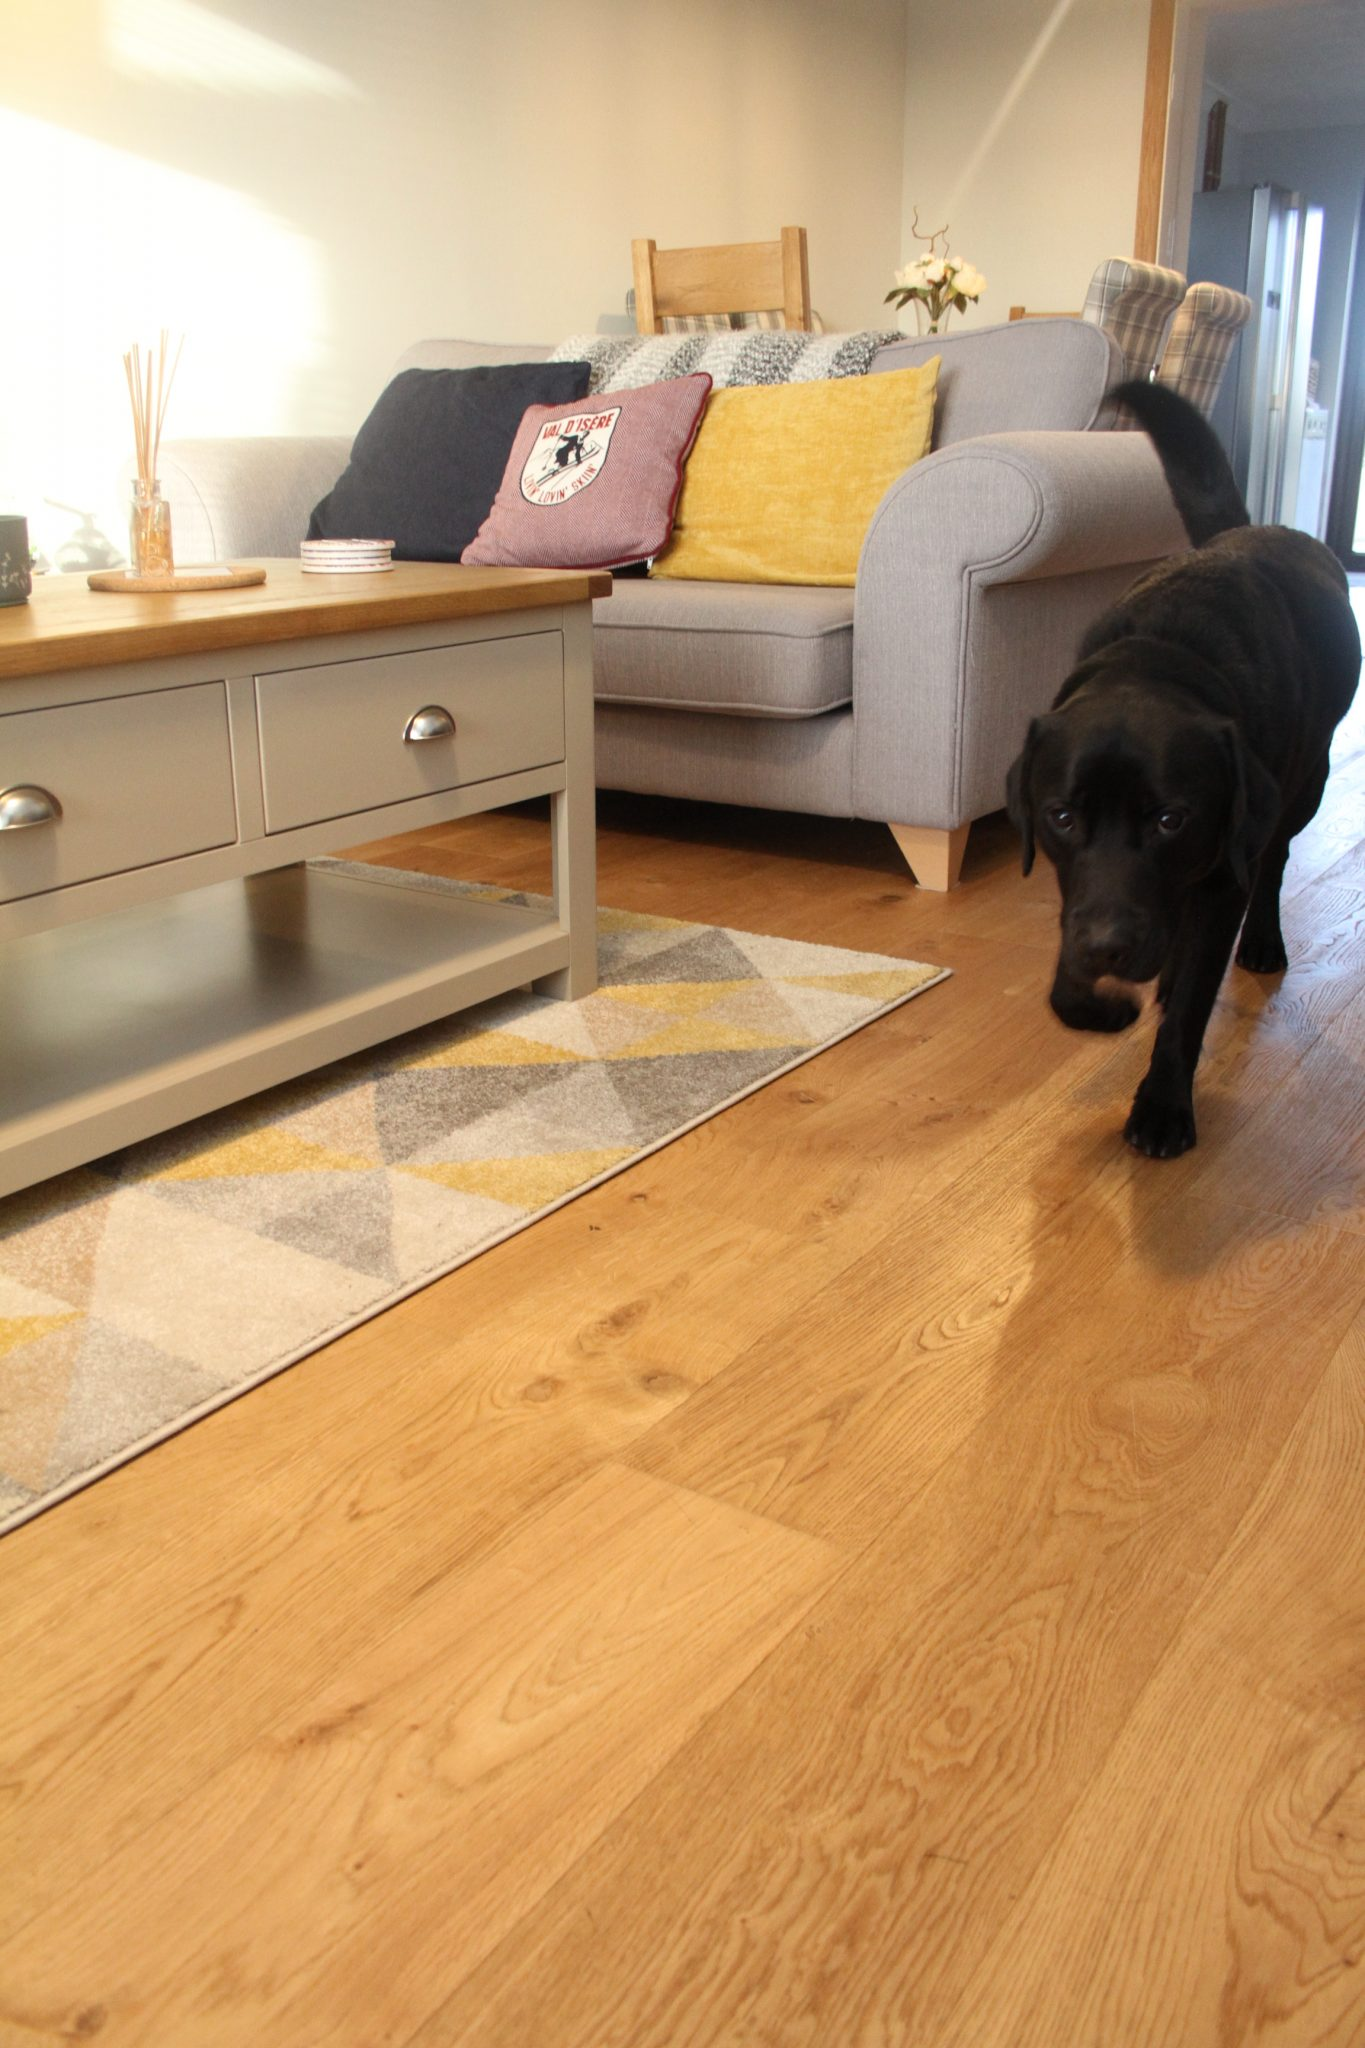 Brushed & Natural Oiled Oak Floor with dog